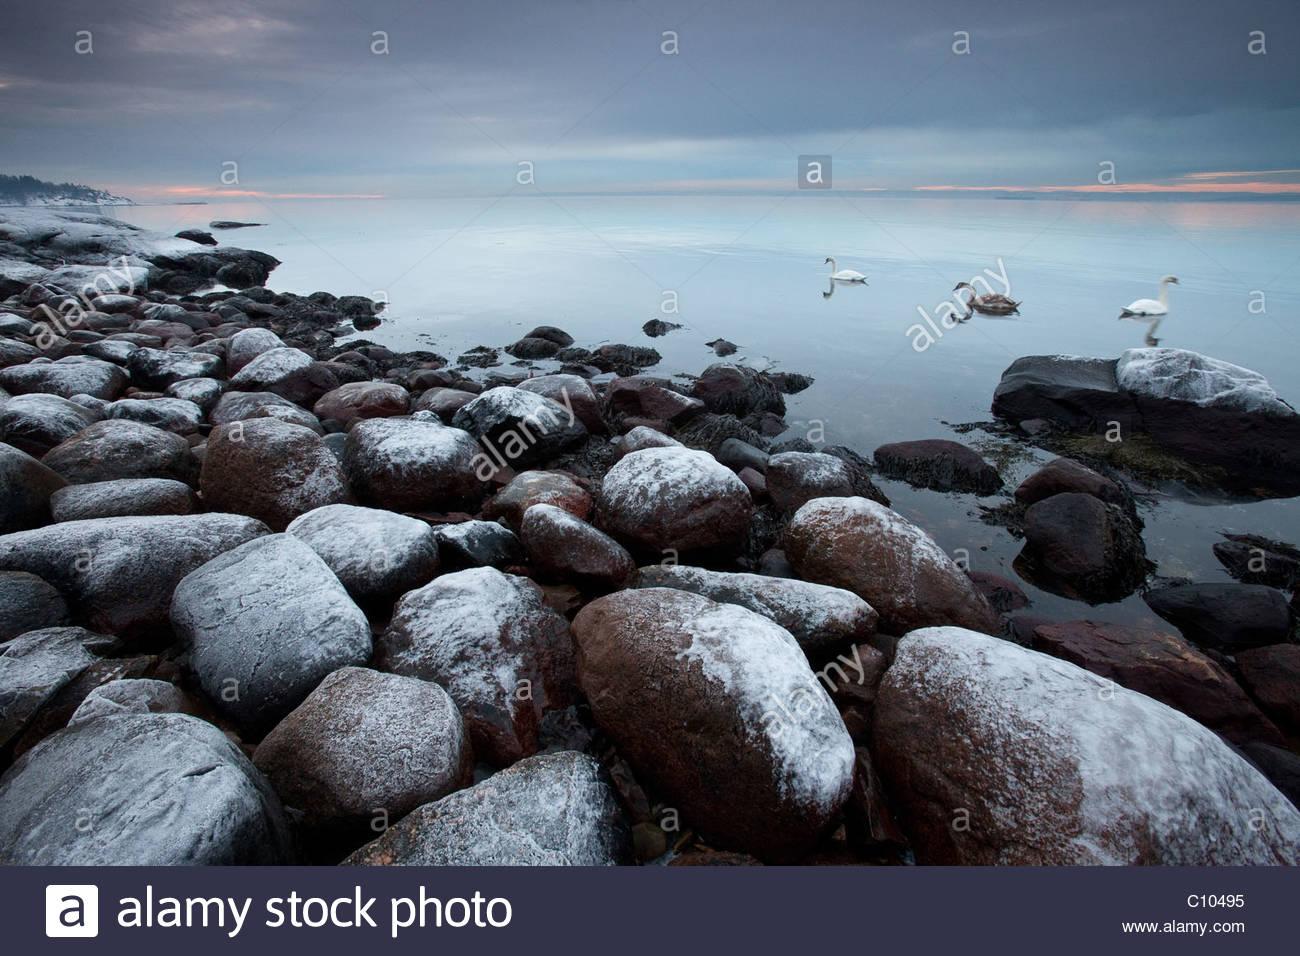 Paisaje invernal y costera Cisne familia Larkollen en Rygge kommune, Østfold fylke, sureste de Noruega. Foto de stock